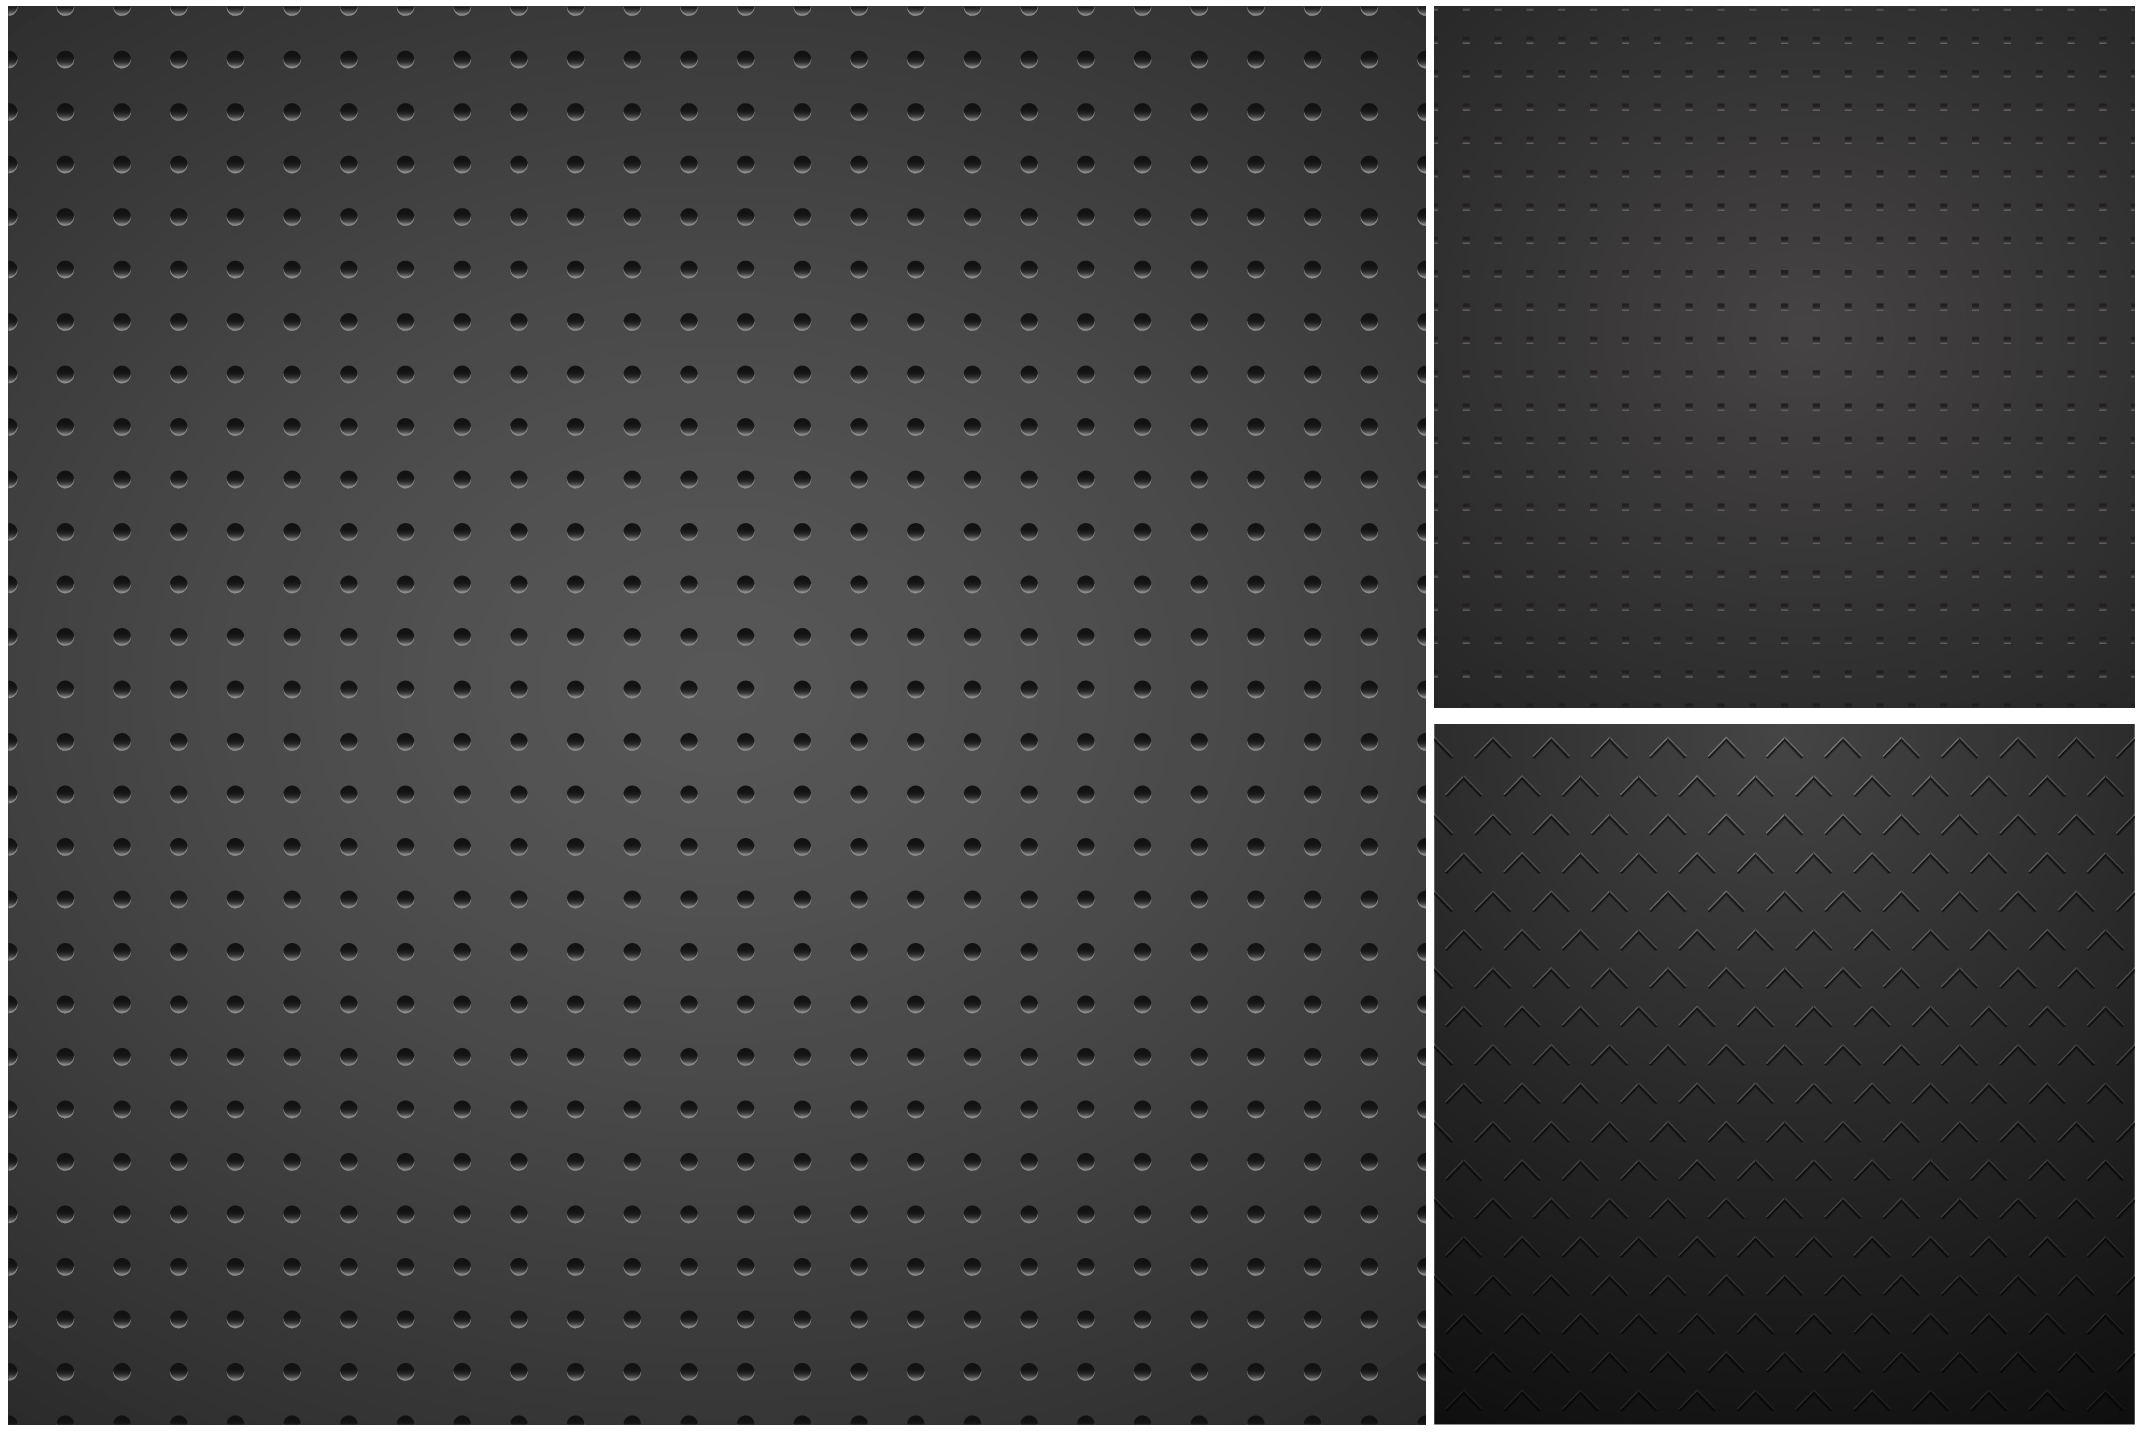 Metallic dark textures with holes. example image 6